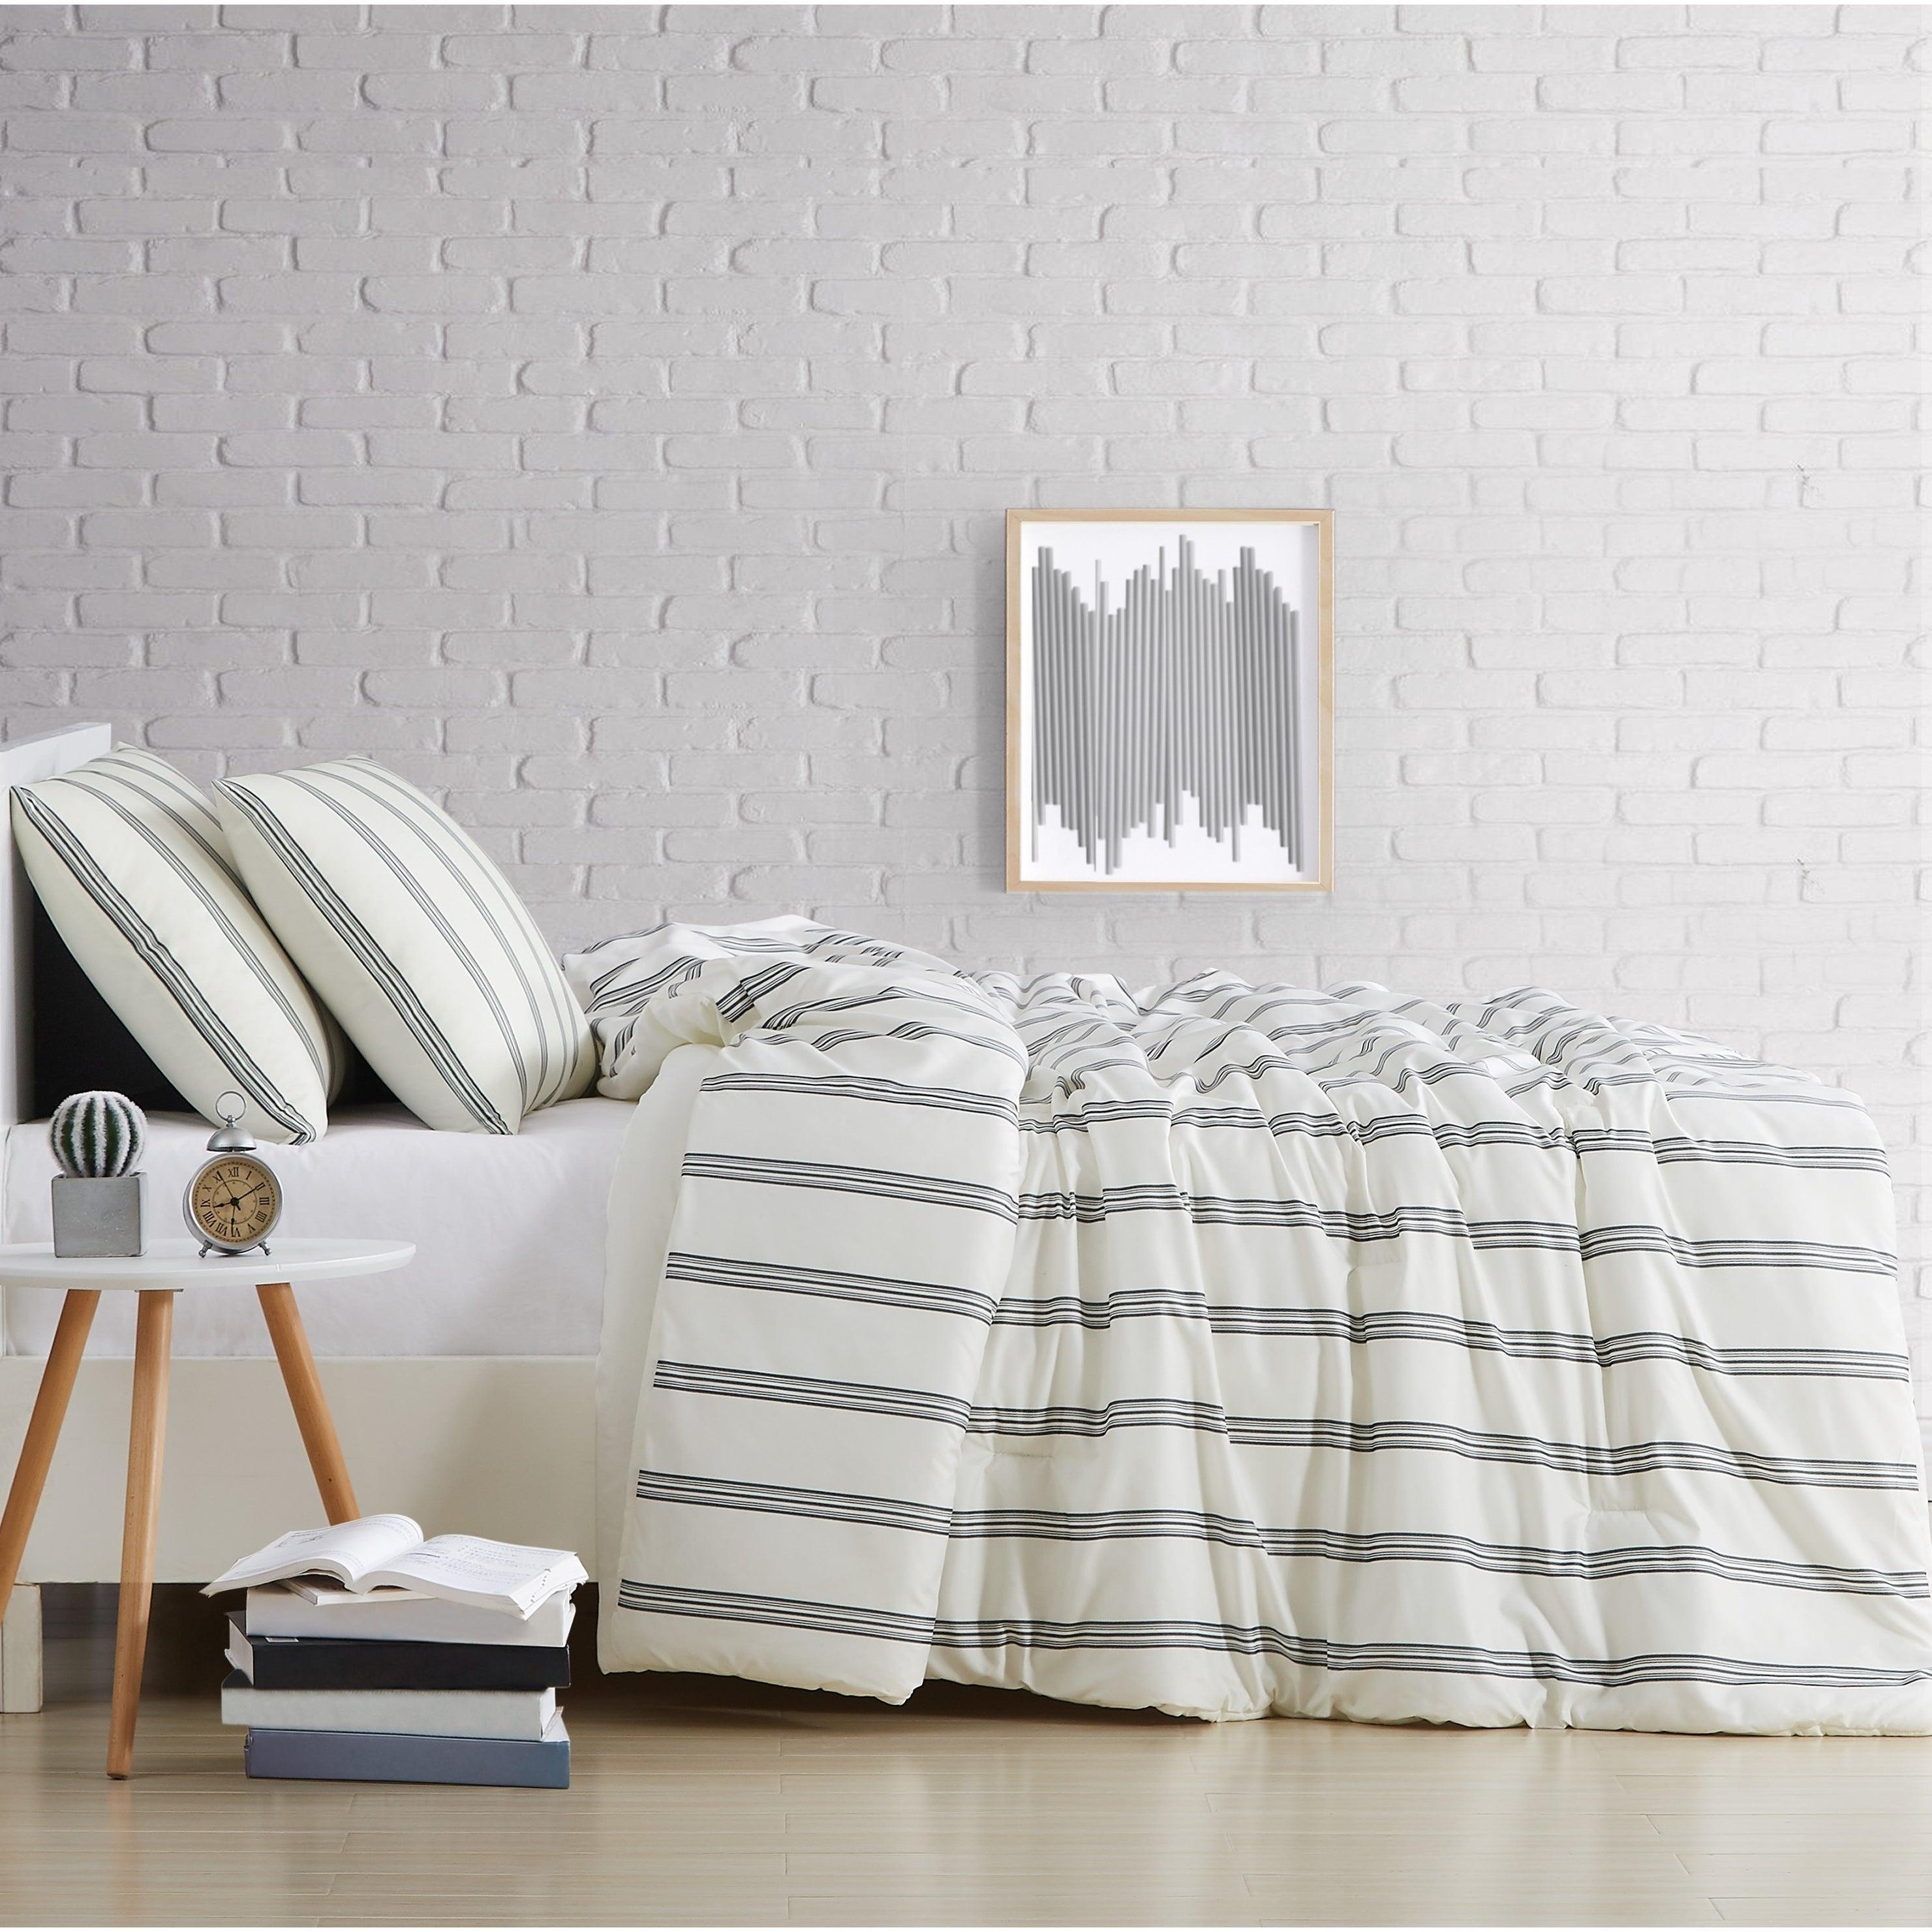 Porch Den Spellman Striped 3 Piececomforter Set On Sale Overstock 28216715